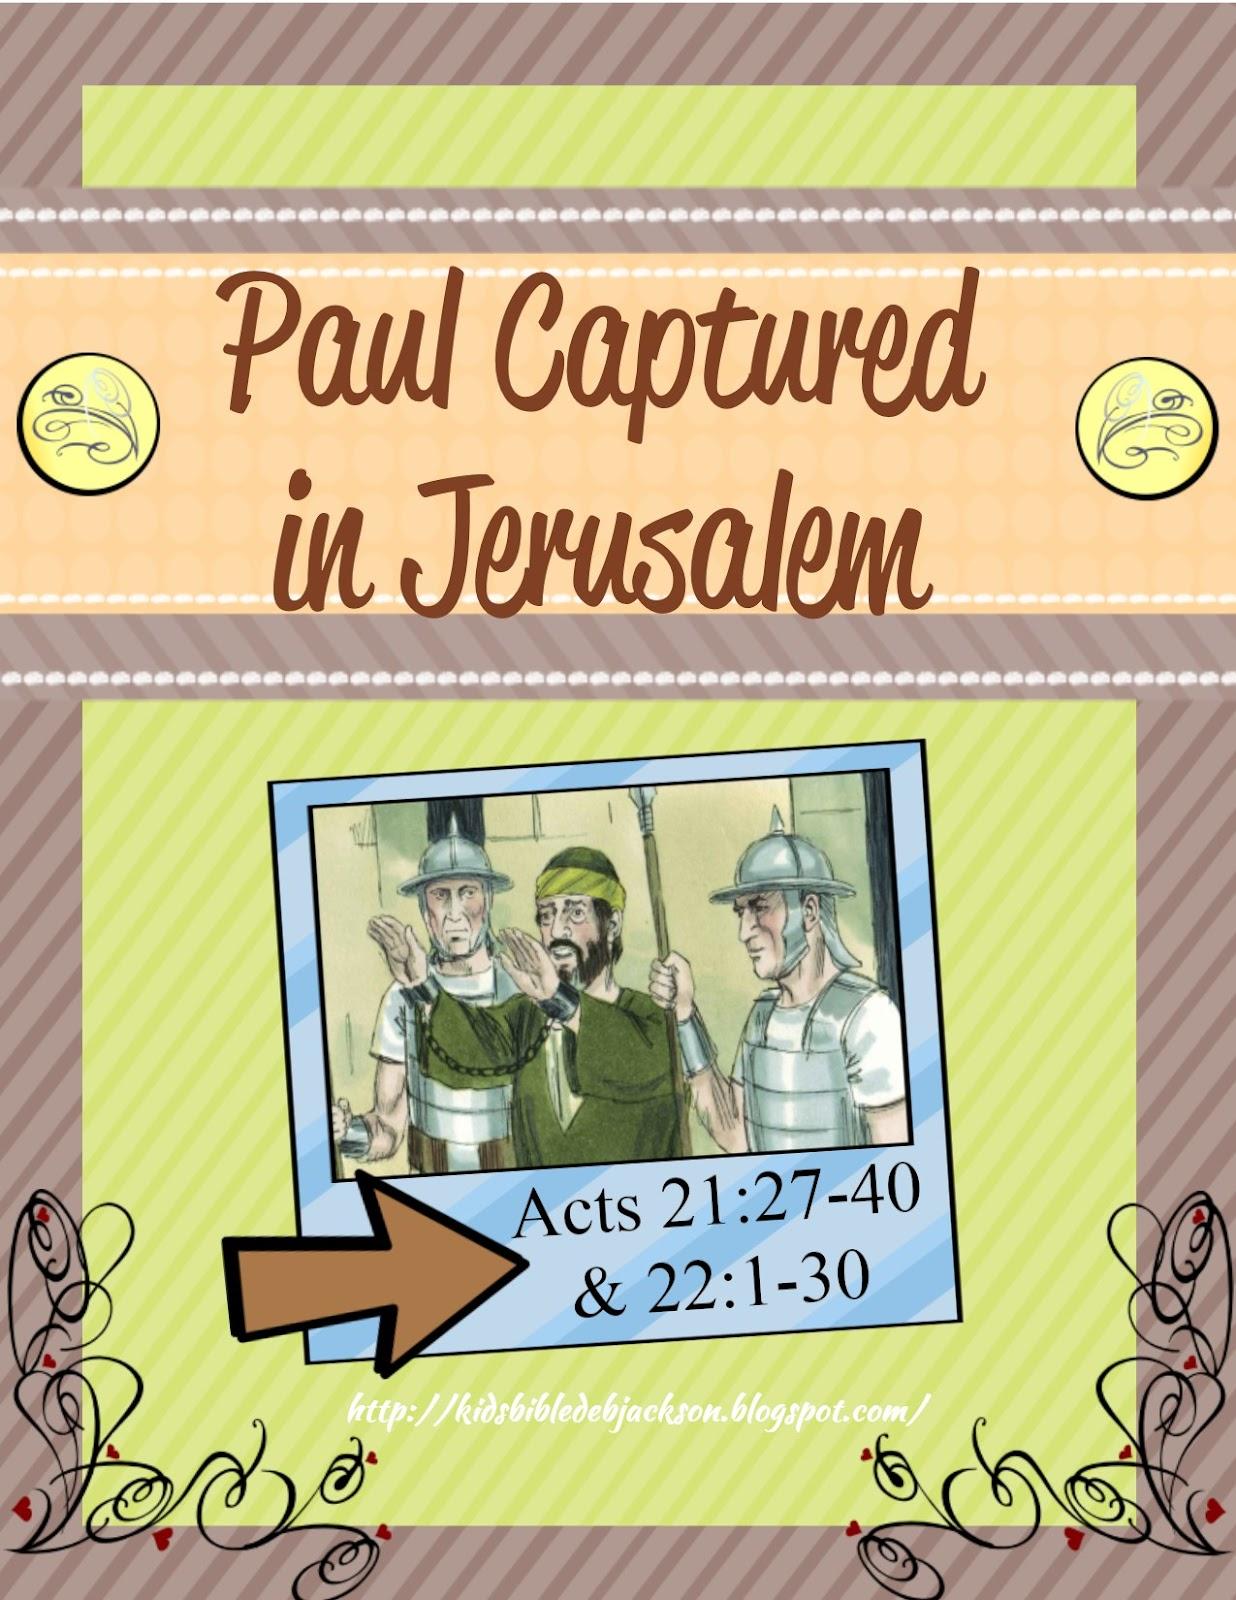 http://www.biblefunforkids.com/2015/04/paul-is-captured-in-jerusalem.html